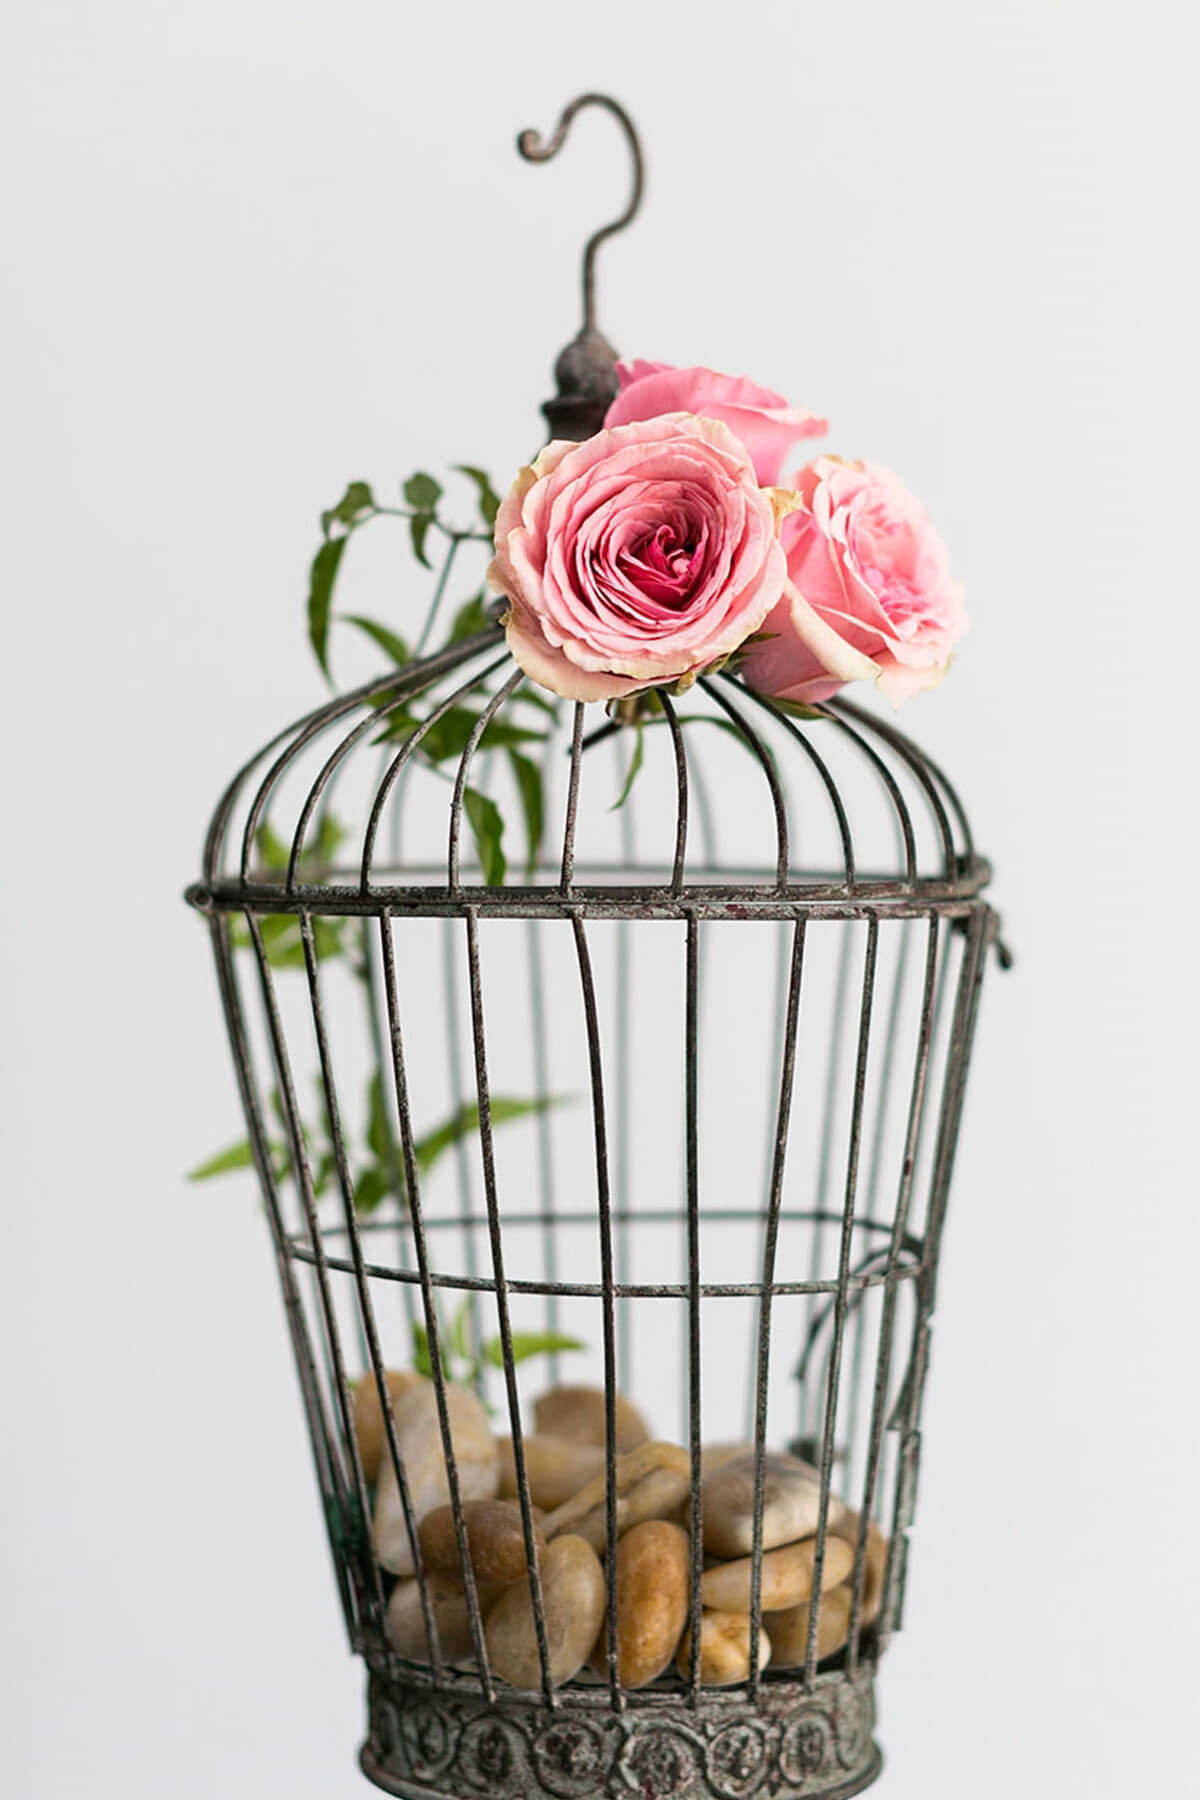 Decorative Birdcages|Bird nests & more|SaveOnCrafts